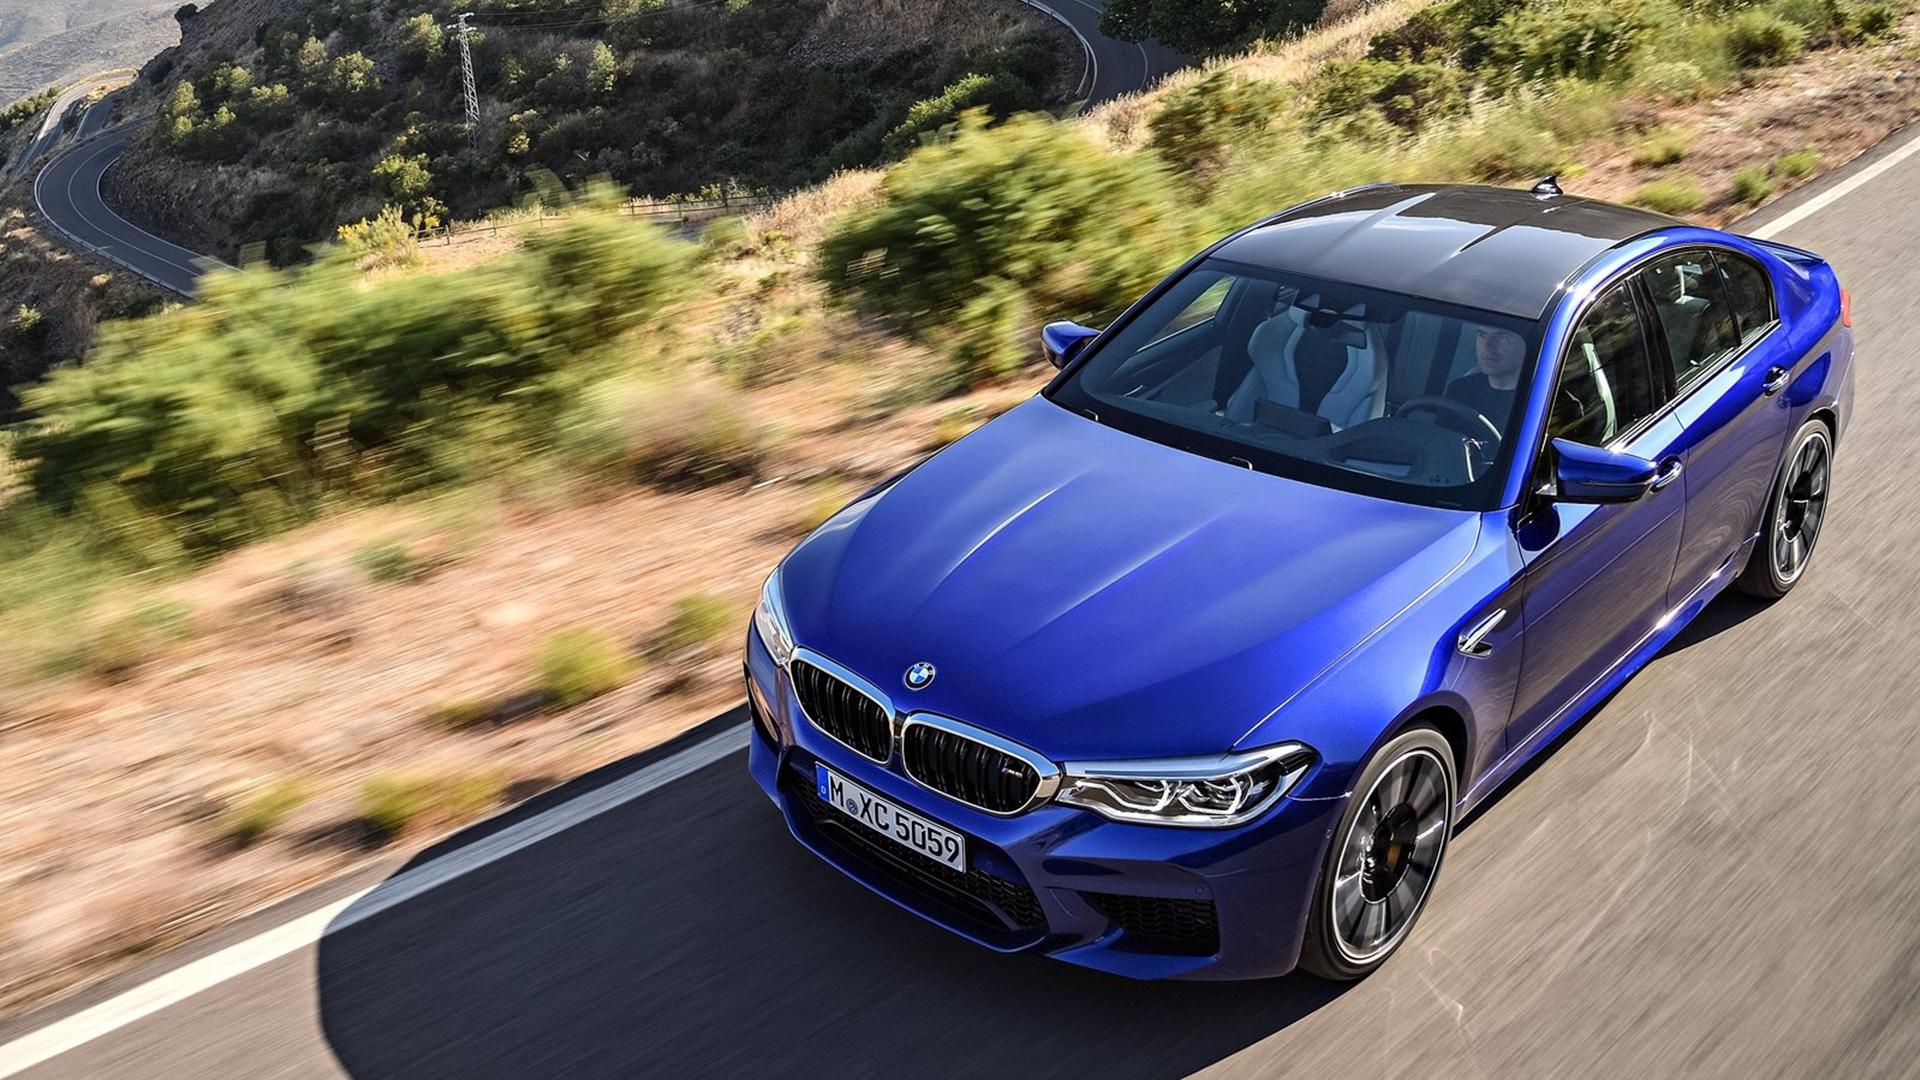 BMW-M5-2018-1600-09.png